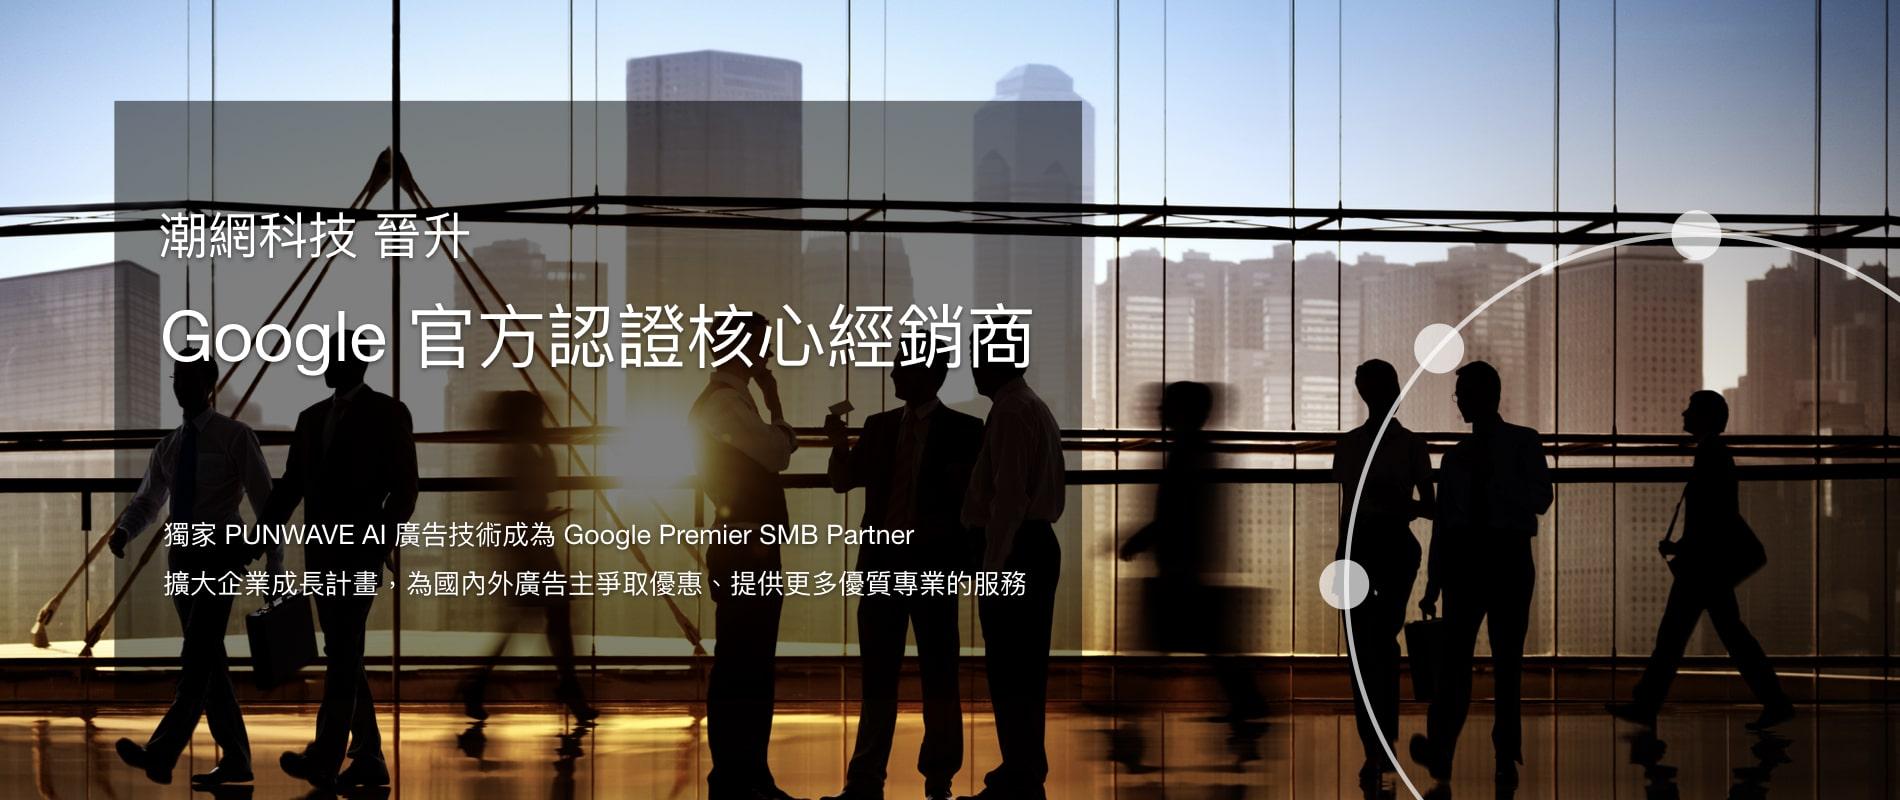 google,電商,優惠,廣告,行銷